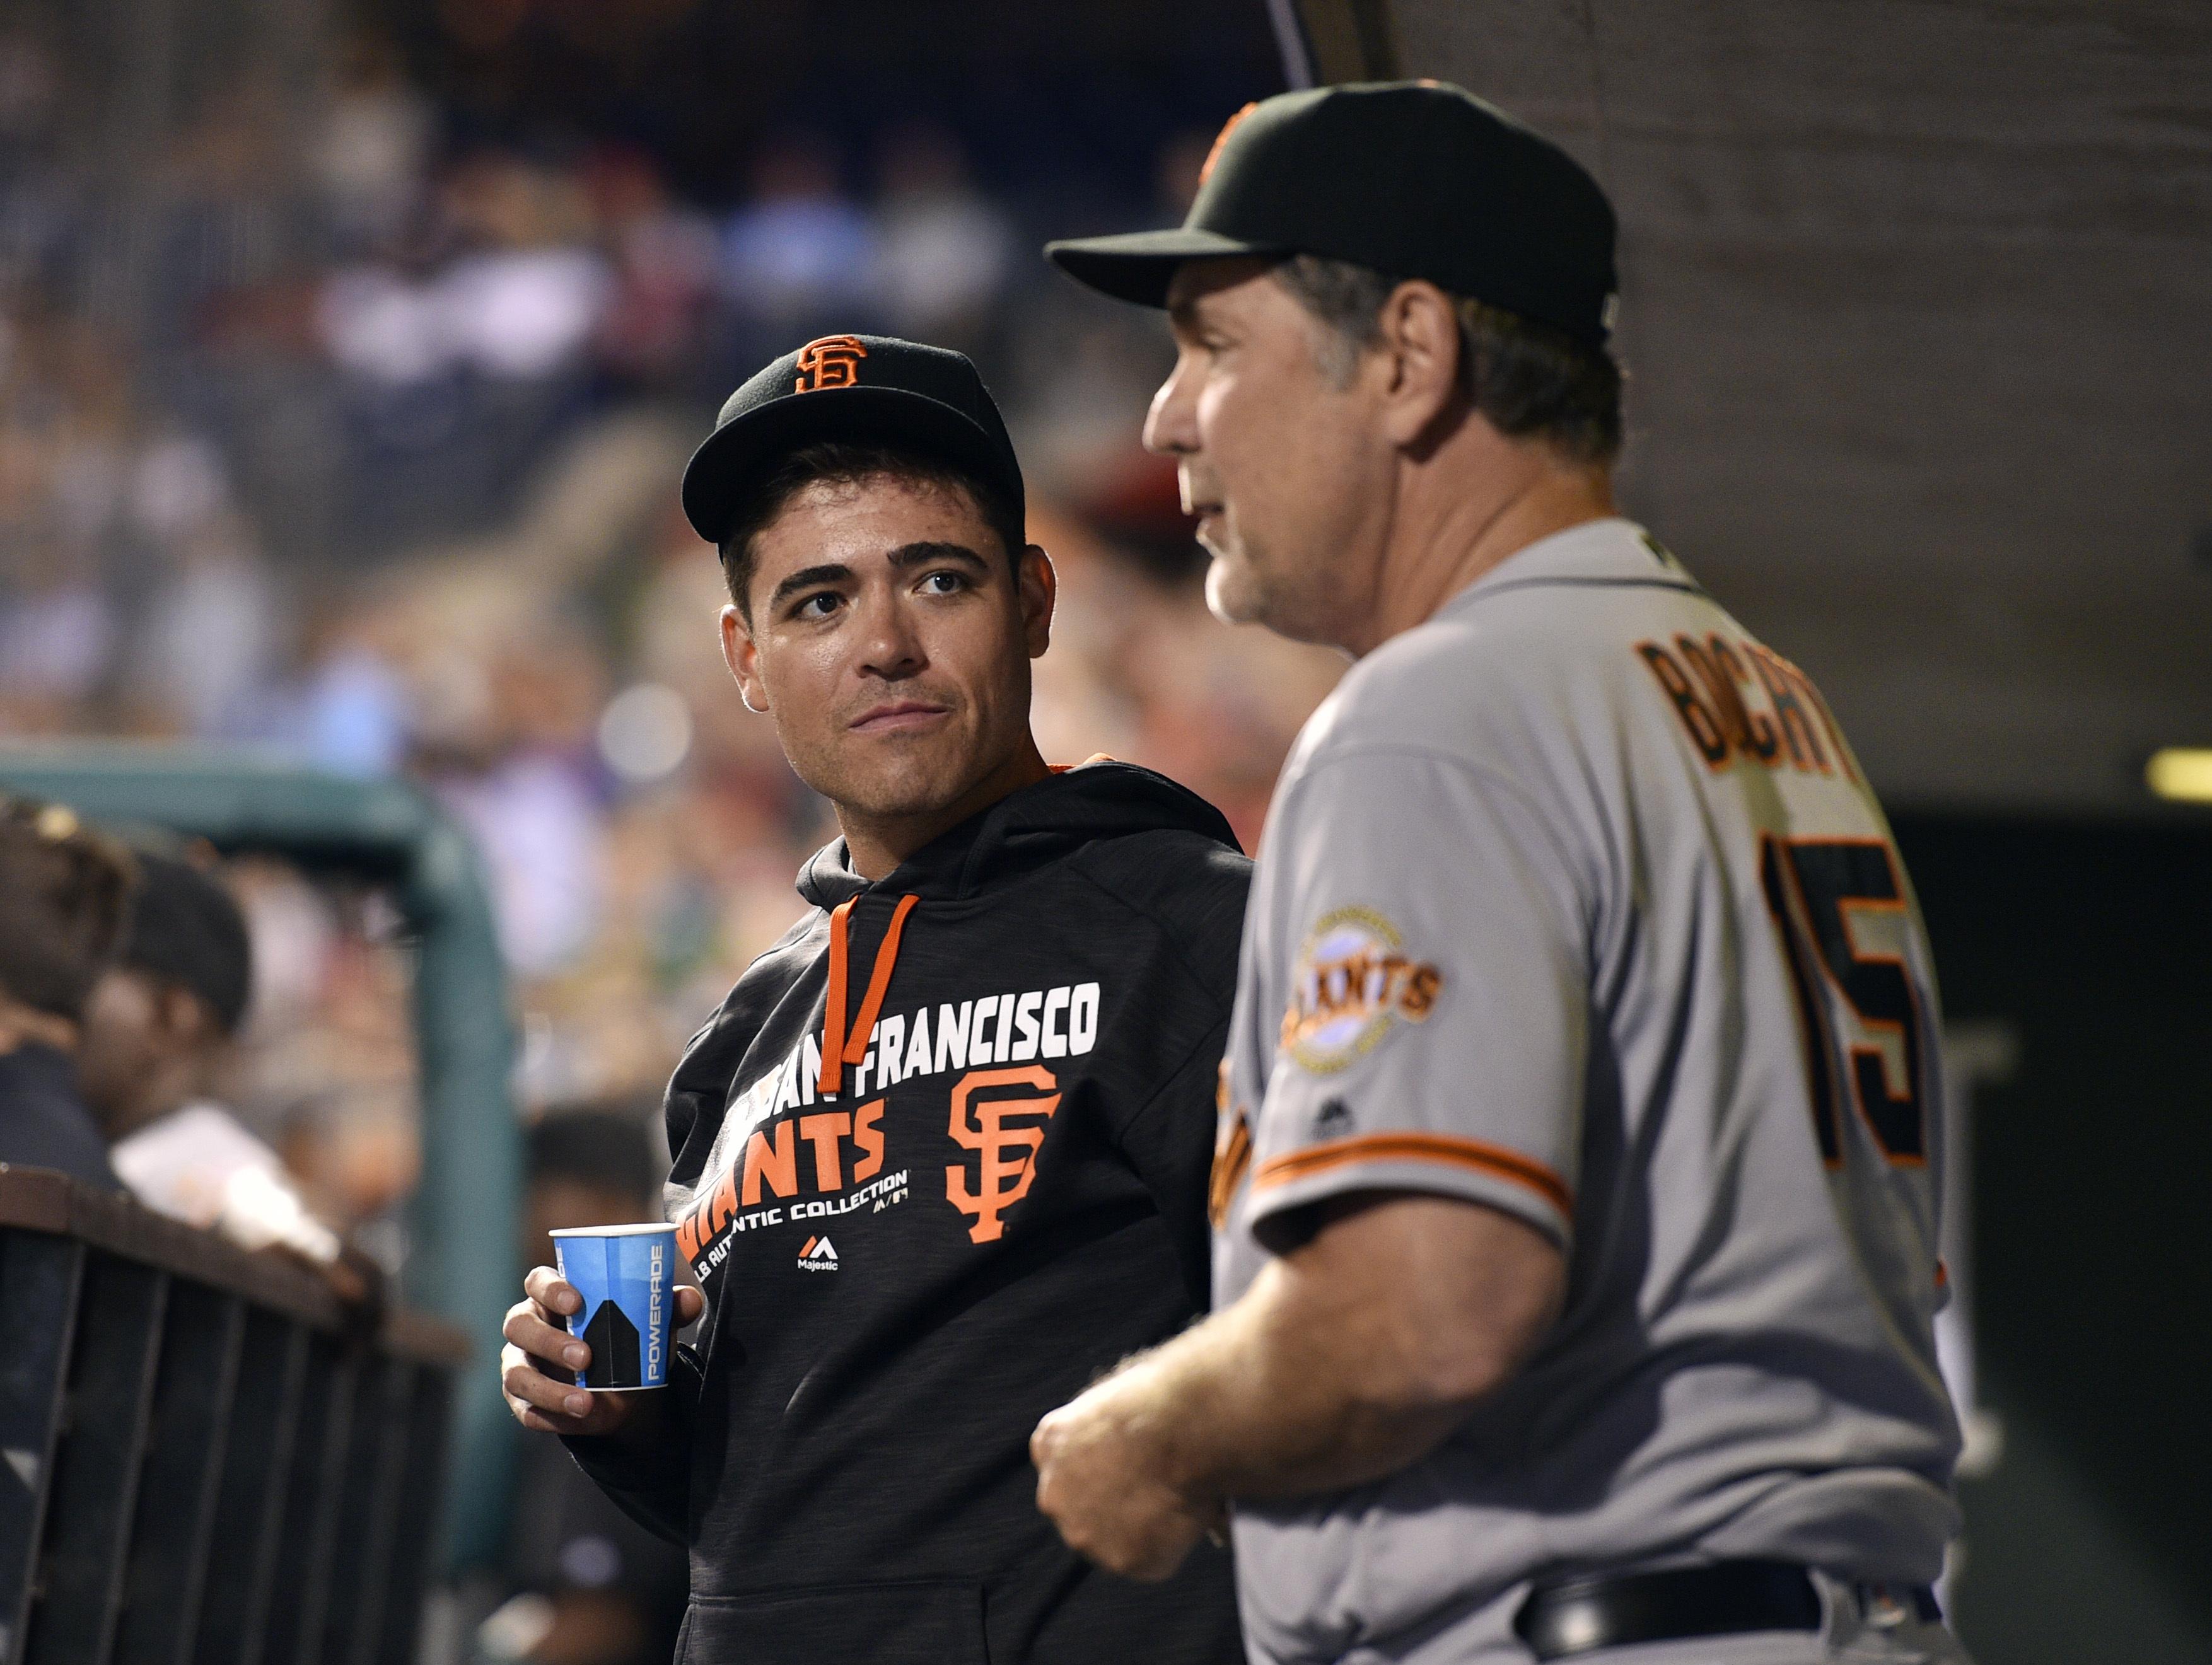 San Francisco Giants' Matt Moore, left, talks to manager Bruce Bochy in the dugout during a baseball game against the Philadelphia Phillies, Tuesday, Aug. 2, 2016, in Philadelphia. (AP Photo/Derik Hamilton)